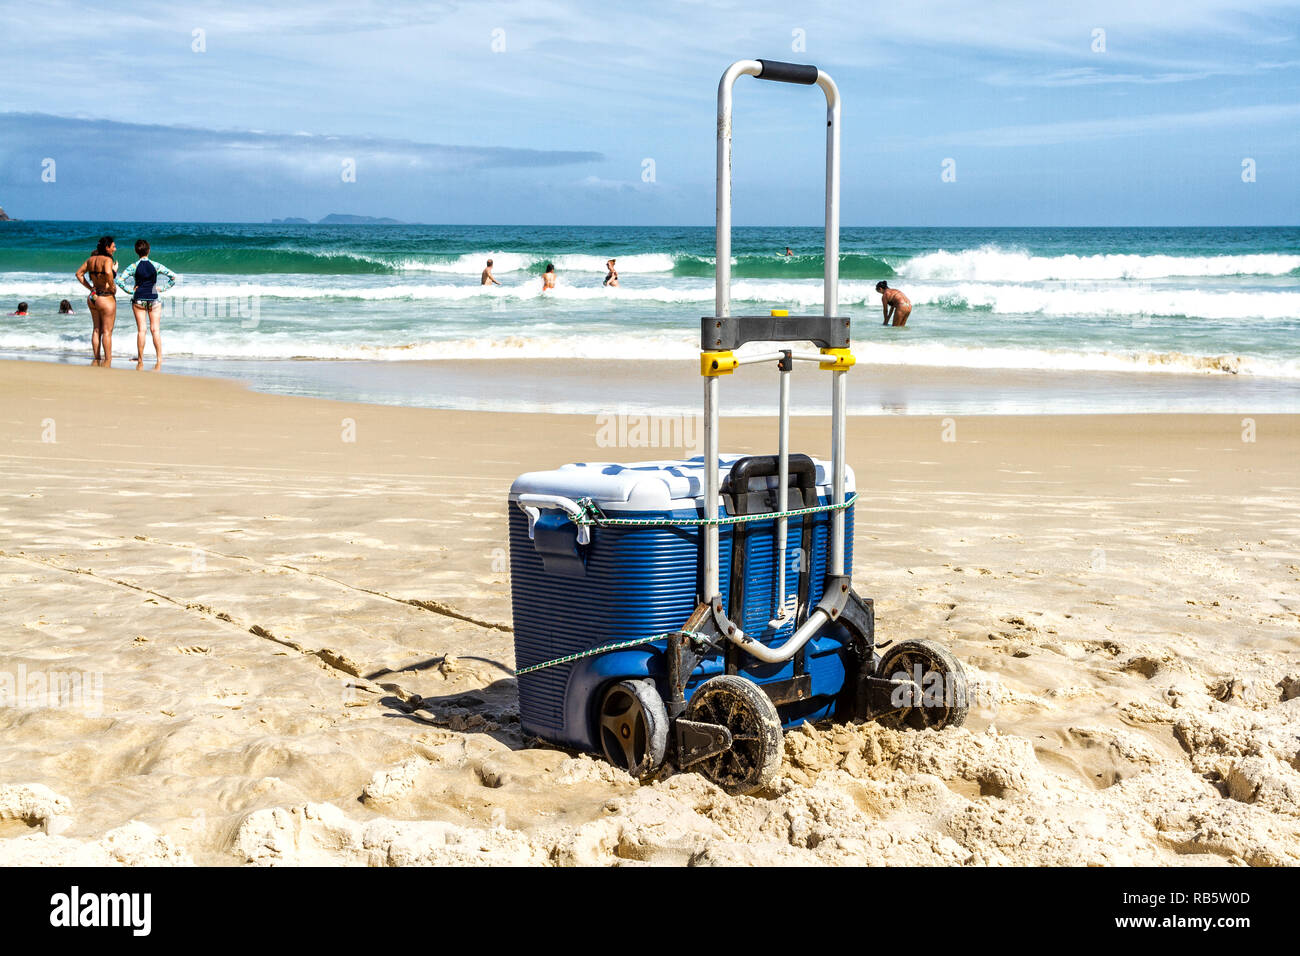 Cooler on the sand at Acores Beach. Florianopolis, Santa Catarina, Brazil. - Stock Image